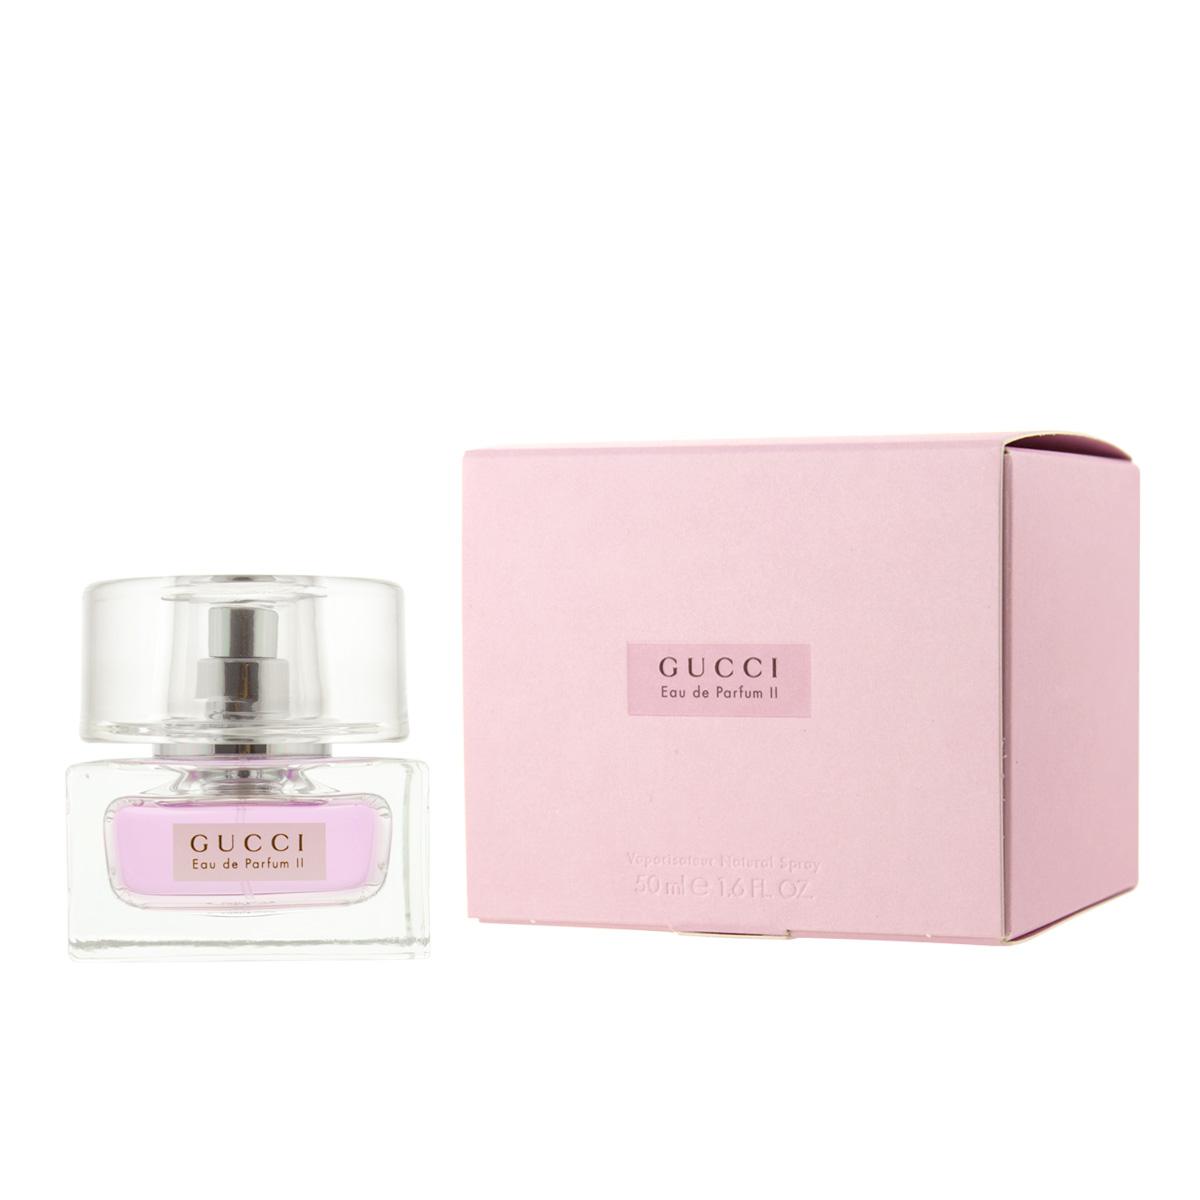 Gucci Eau De Parfum ll EDP 50 ml W